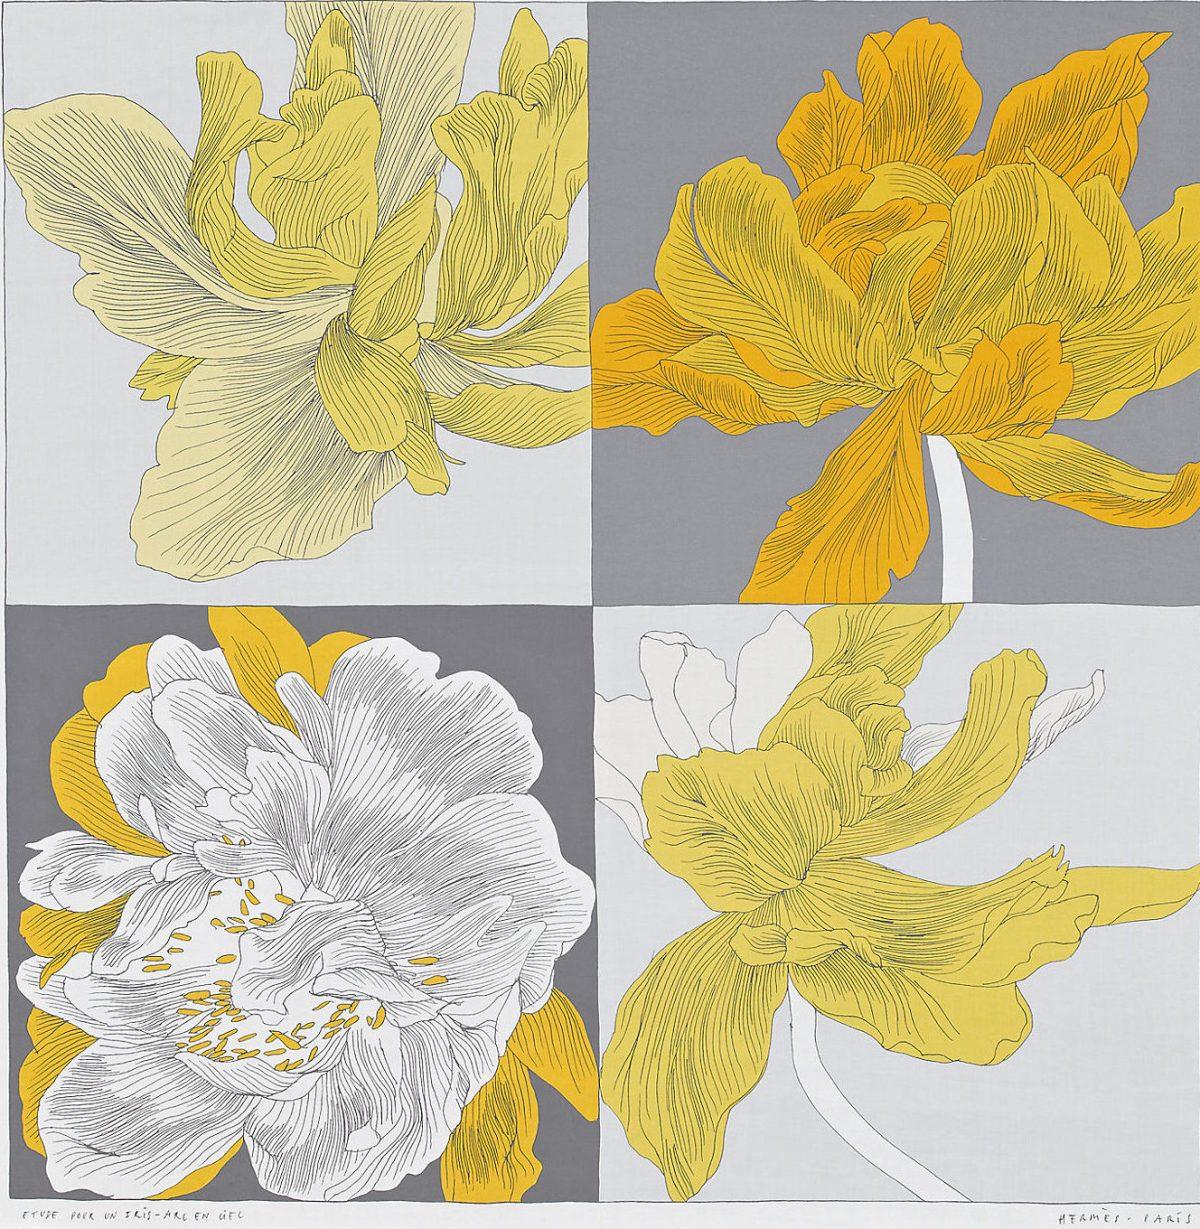 etude-pour-un-iris-arc-en-ciel-chiffon-shawl-140--343080S 03-flat-1-300-0-1680-1680